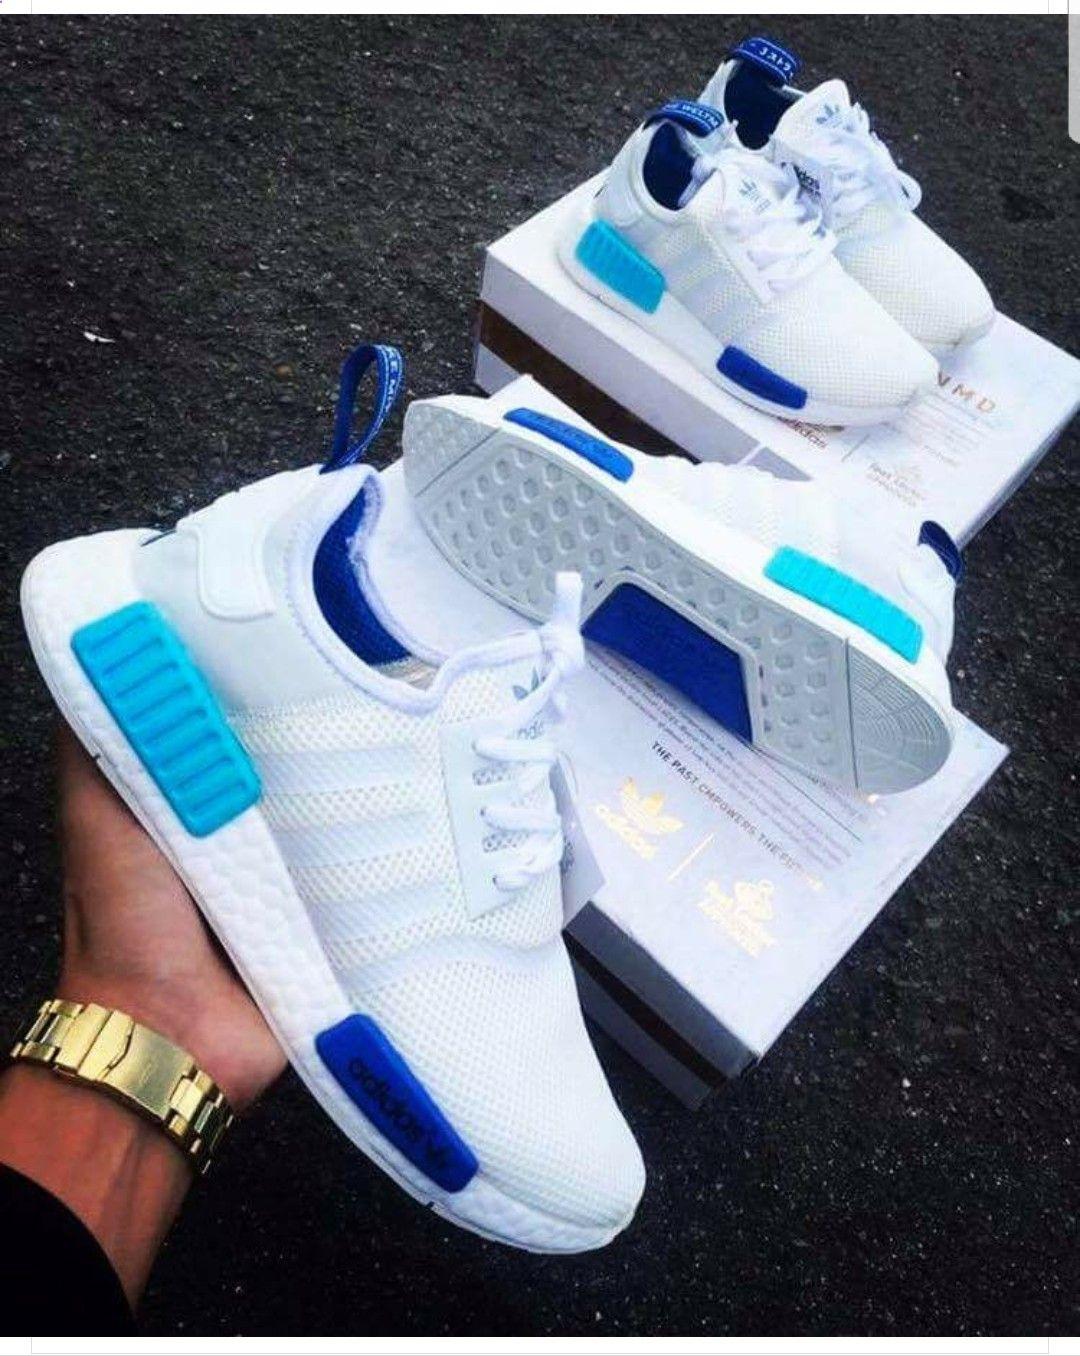 cheap for discount 58393 07cb4 Adidas NMD R1 White Blue Glow. Adidas NMD R1 White Blue Glow Adidas Shoes  ...